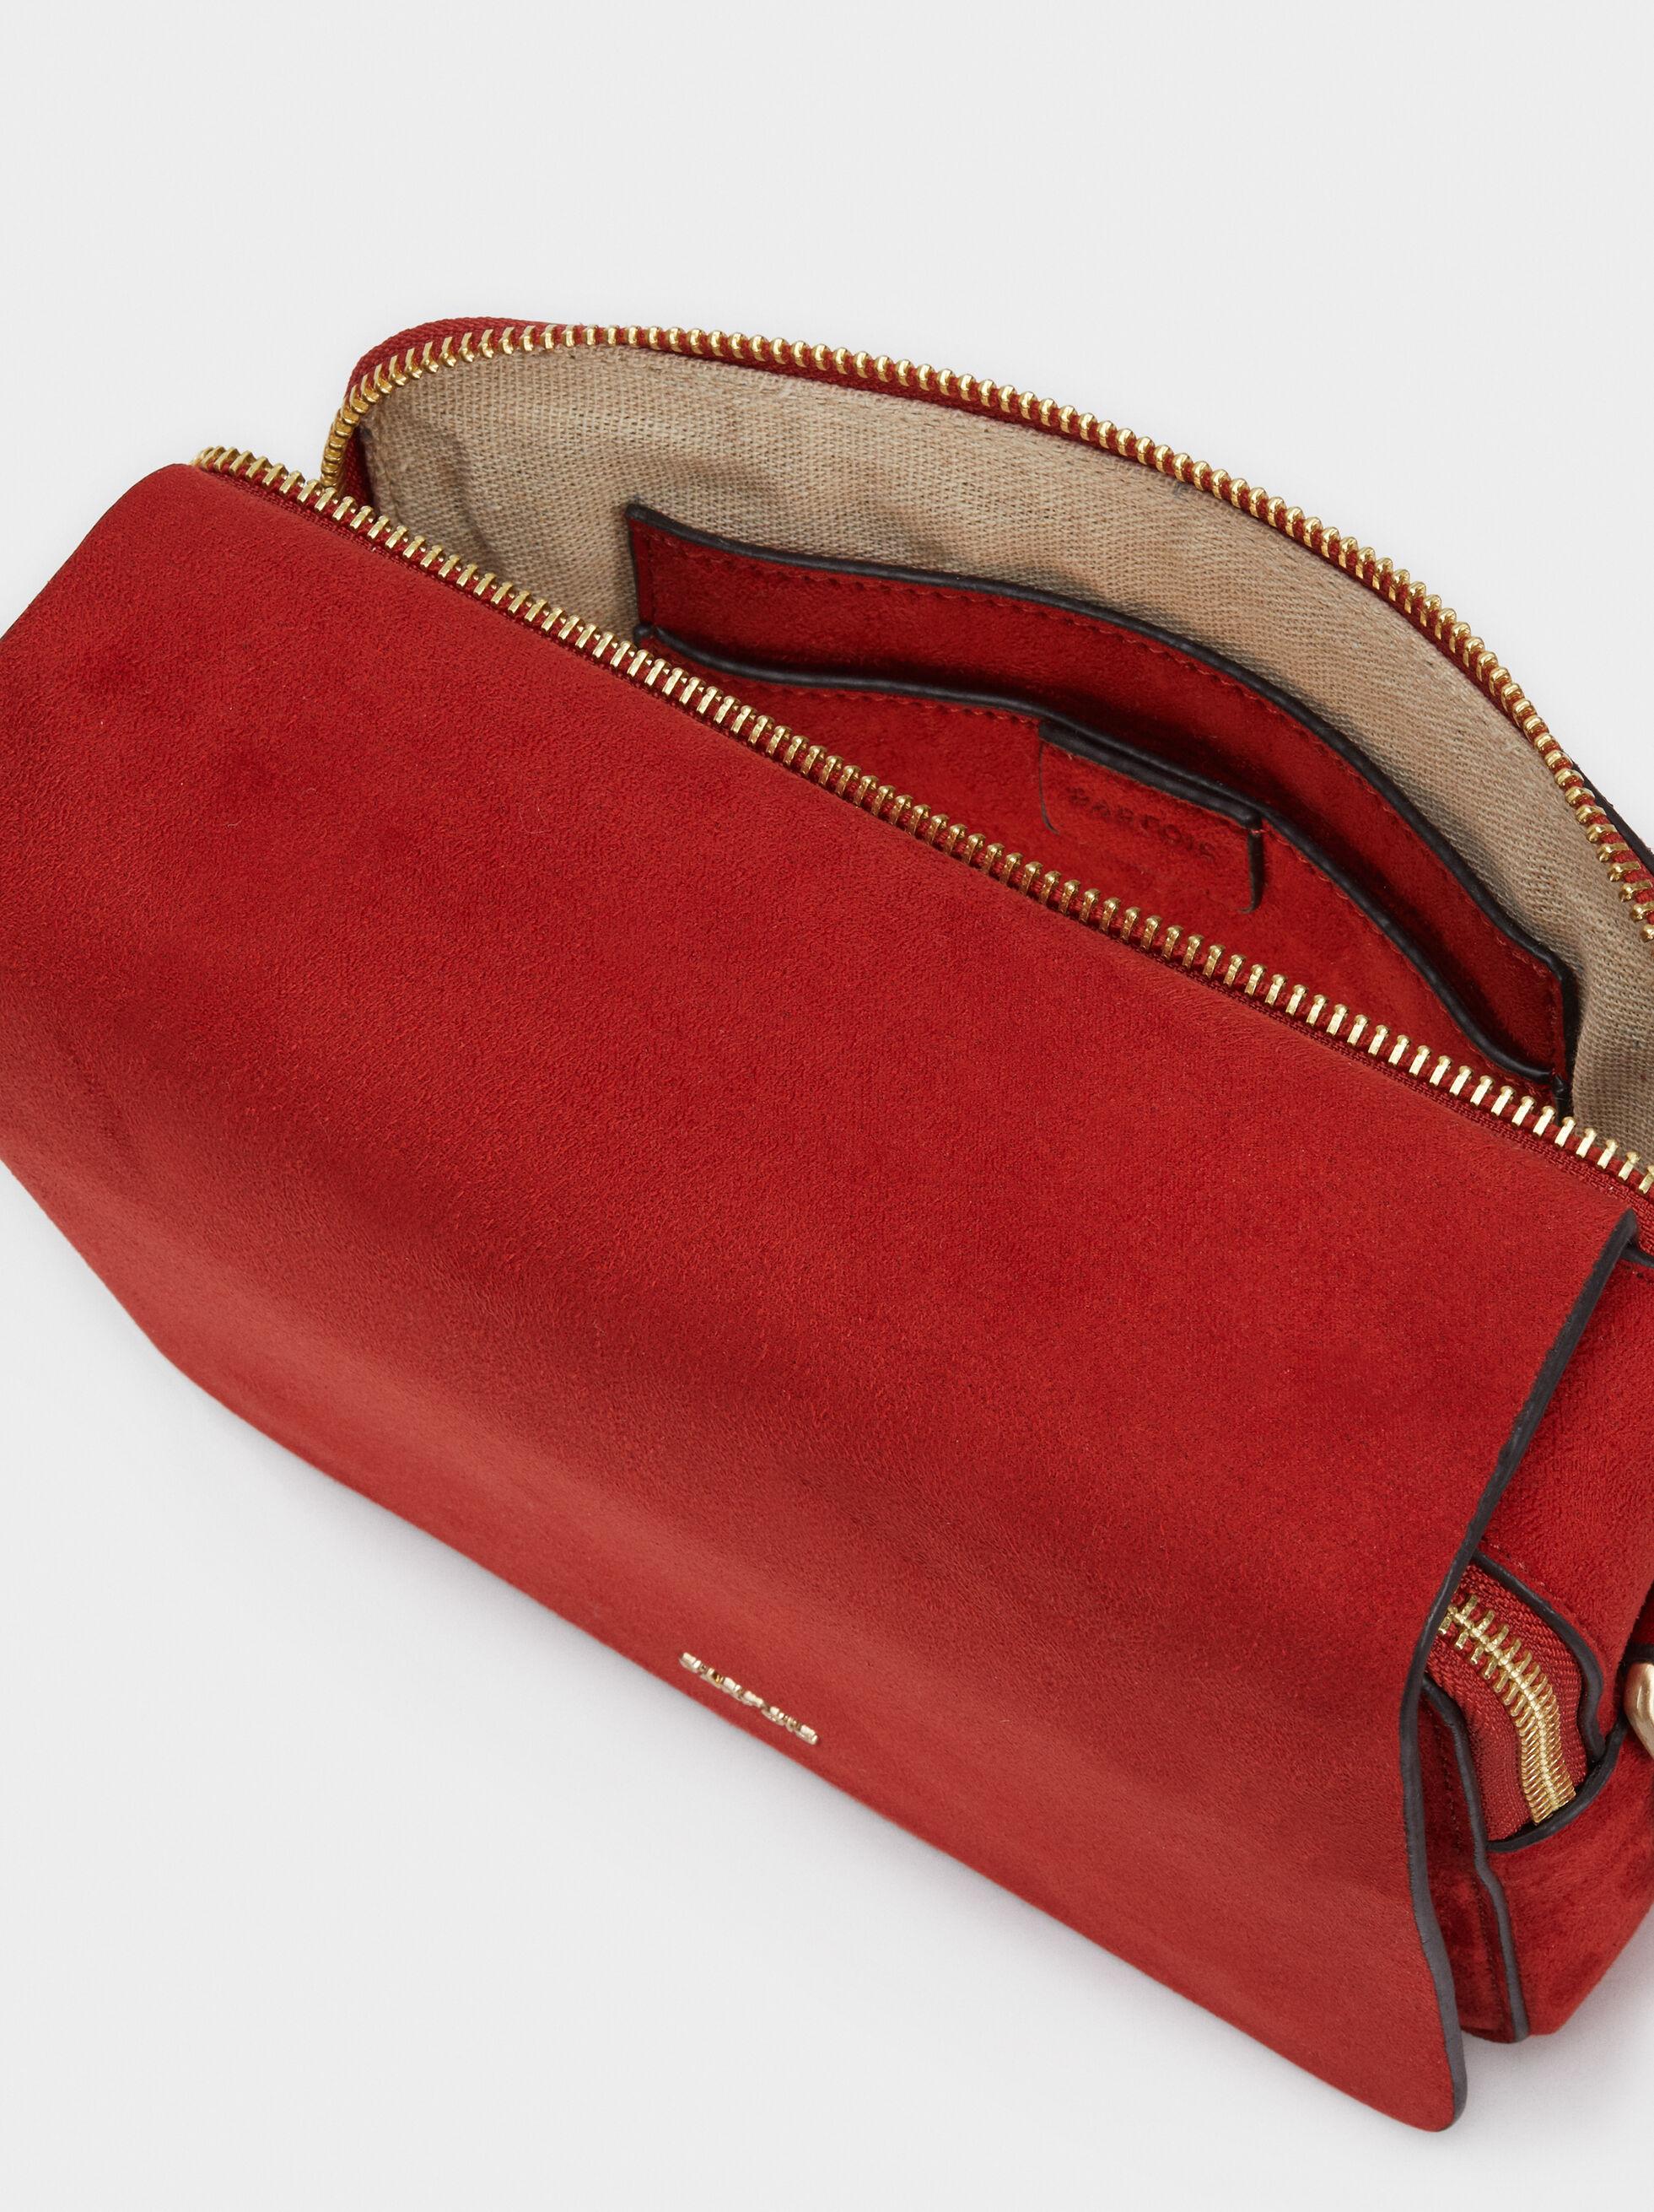 Adjustable Textured Suede Crossbody Bag, Brick Red, hi-res